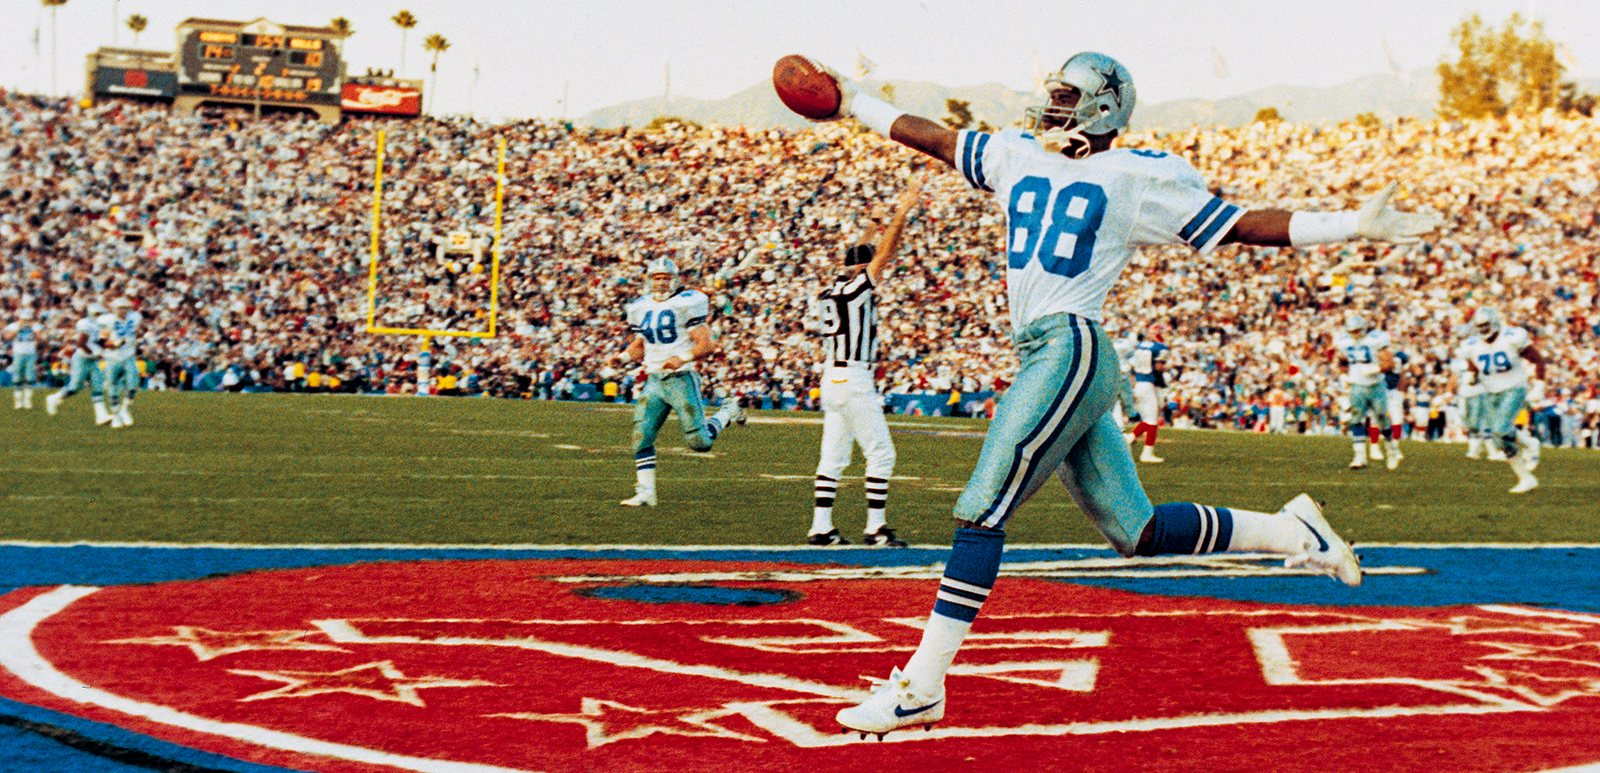 Michael Irvin, Super Bowl XXVII